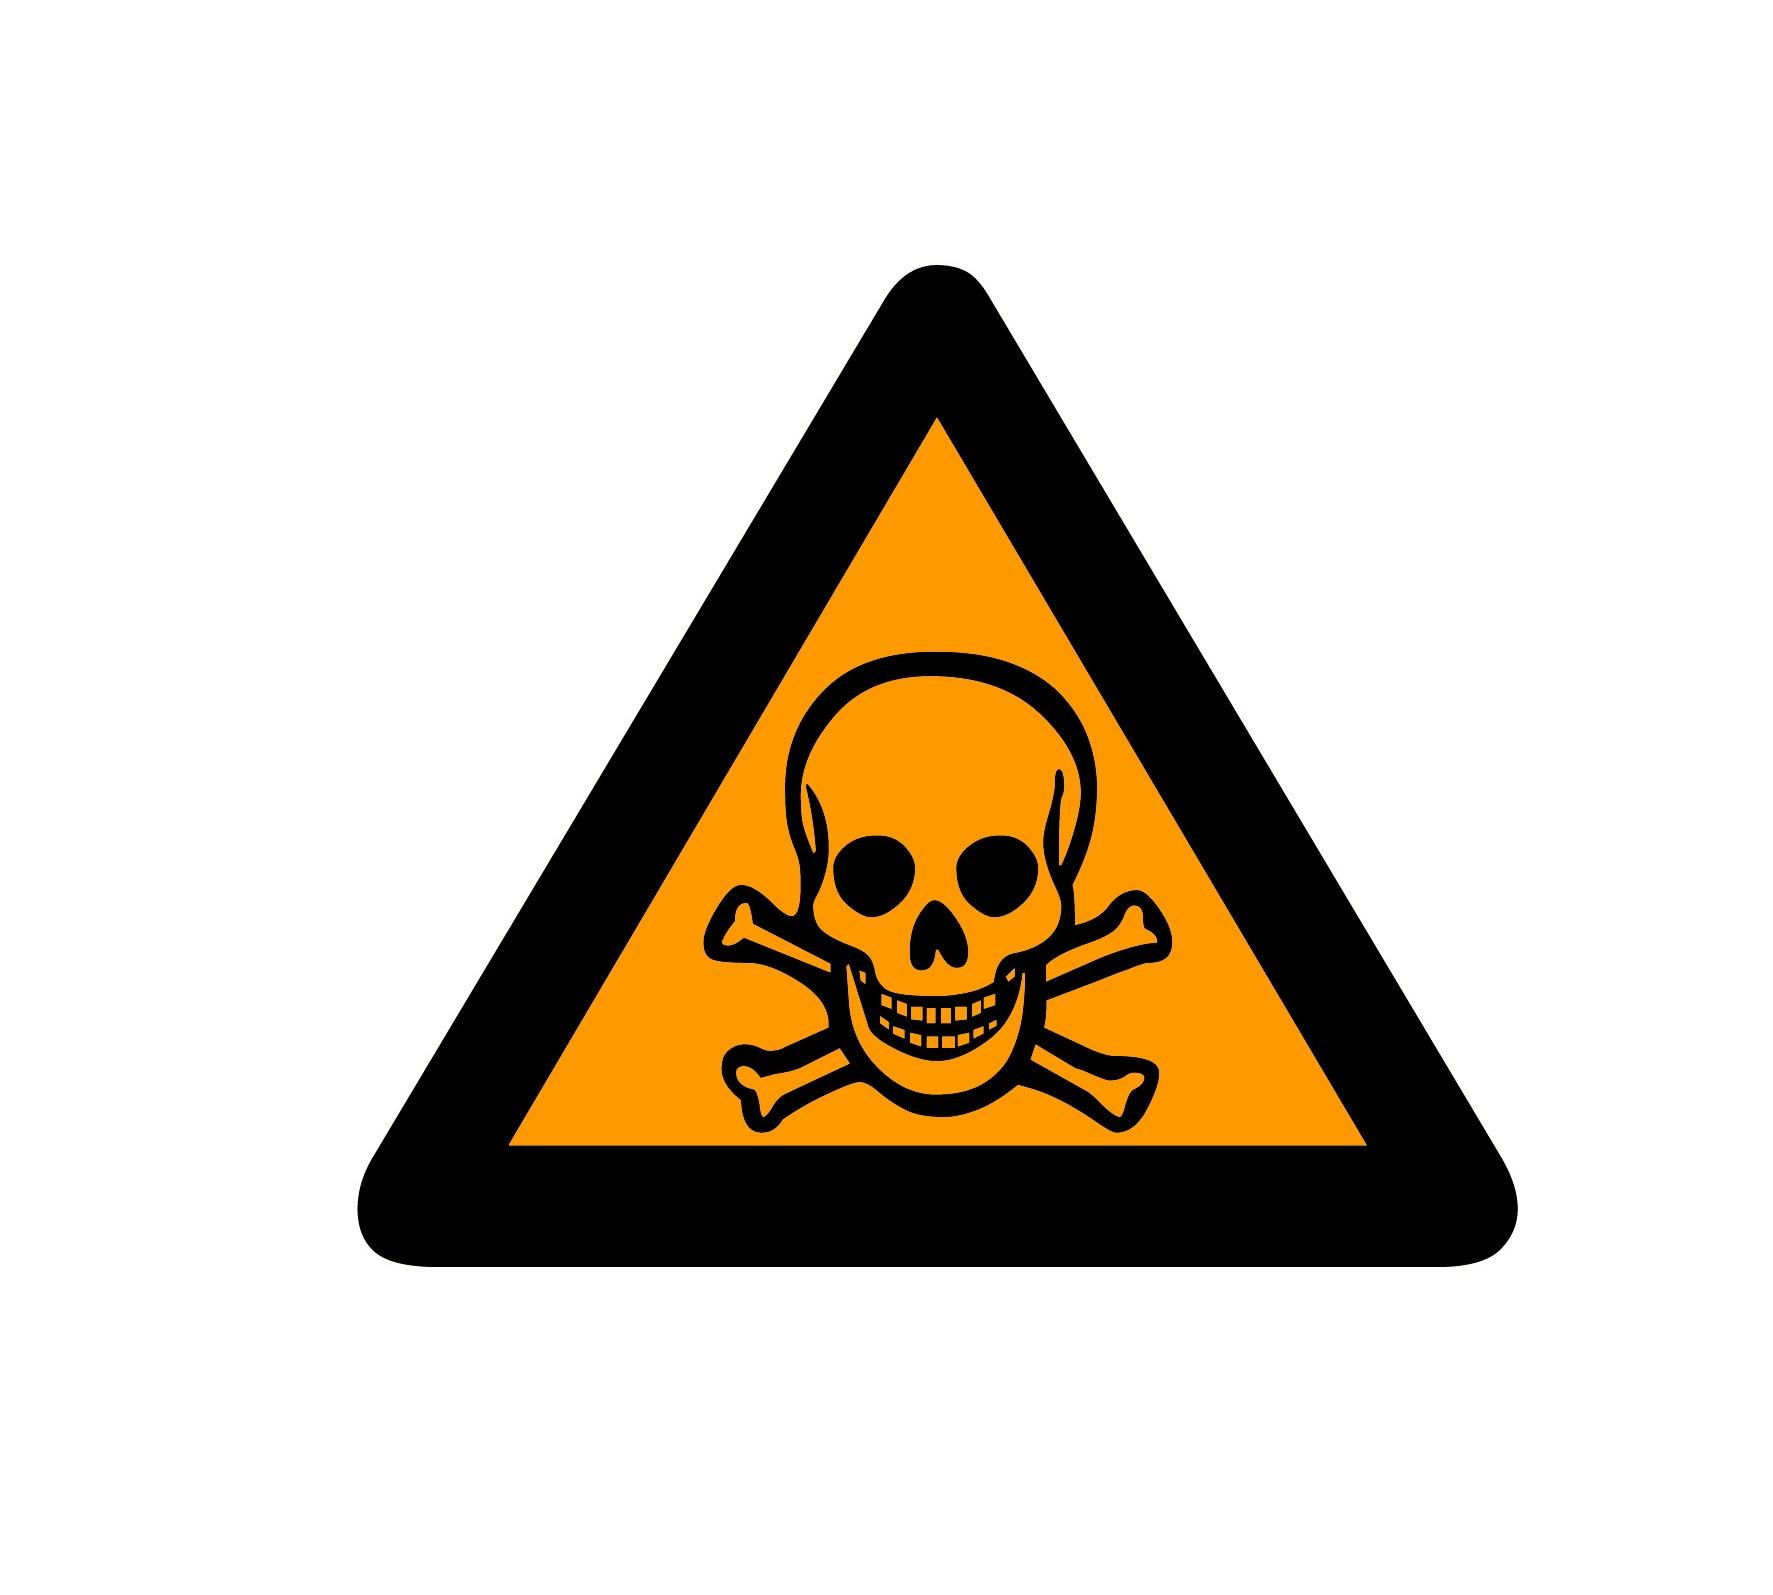 How To Draw Toxic Symbol